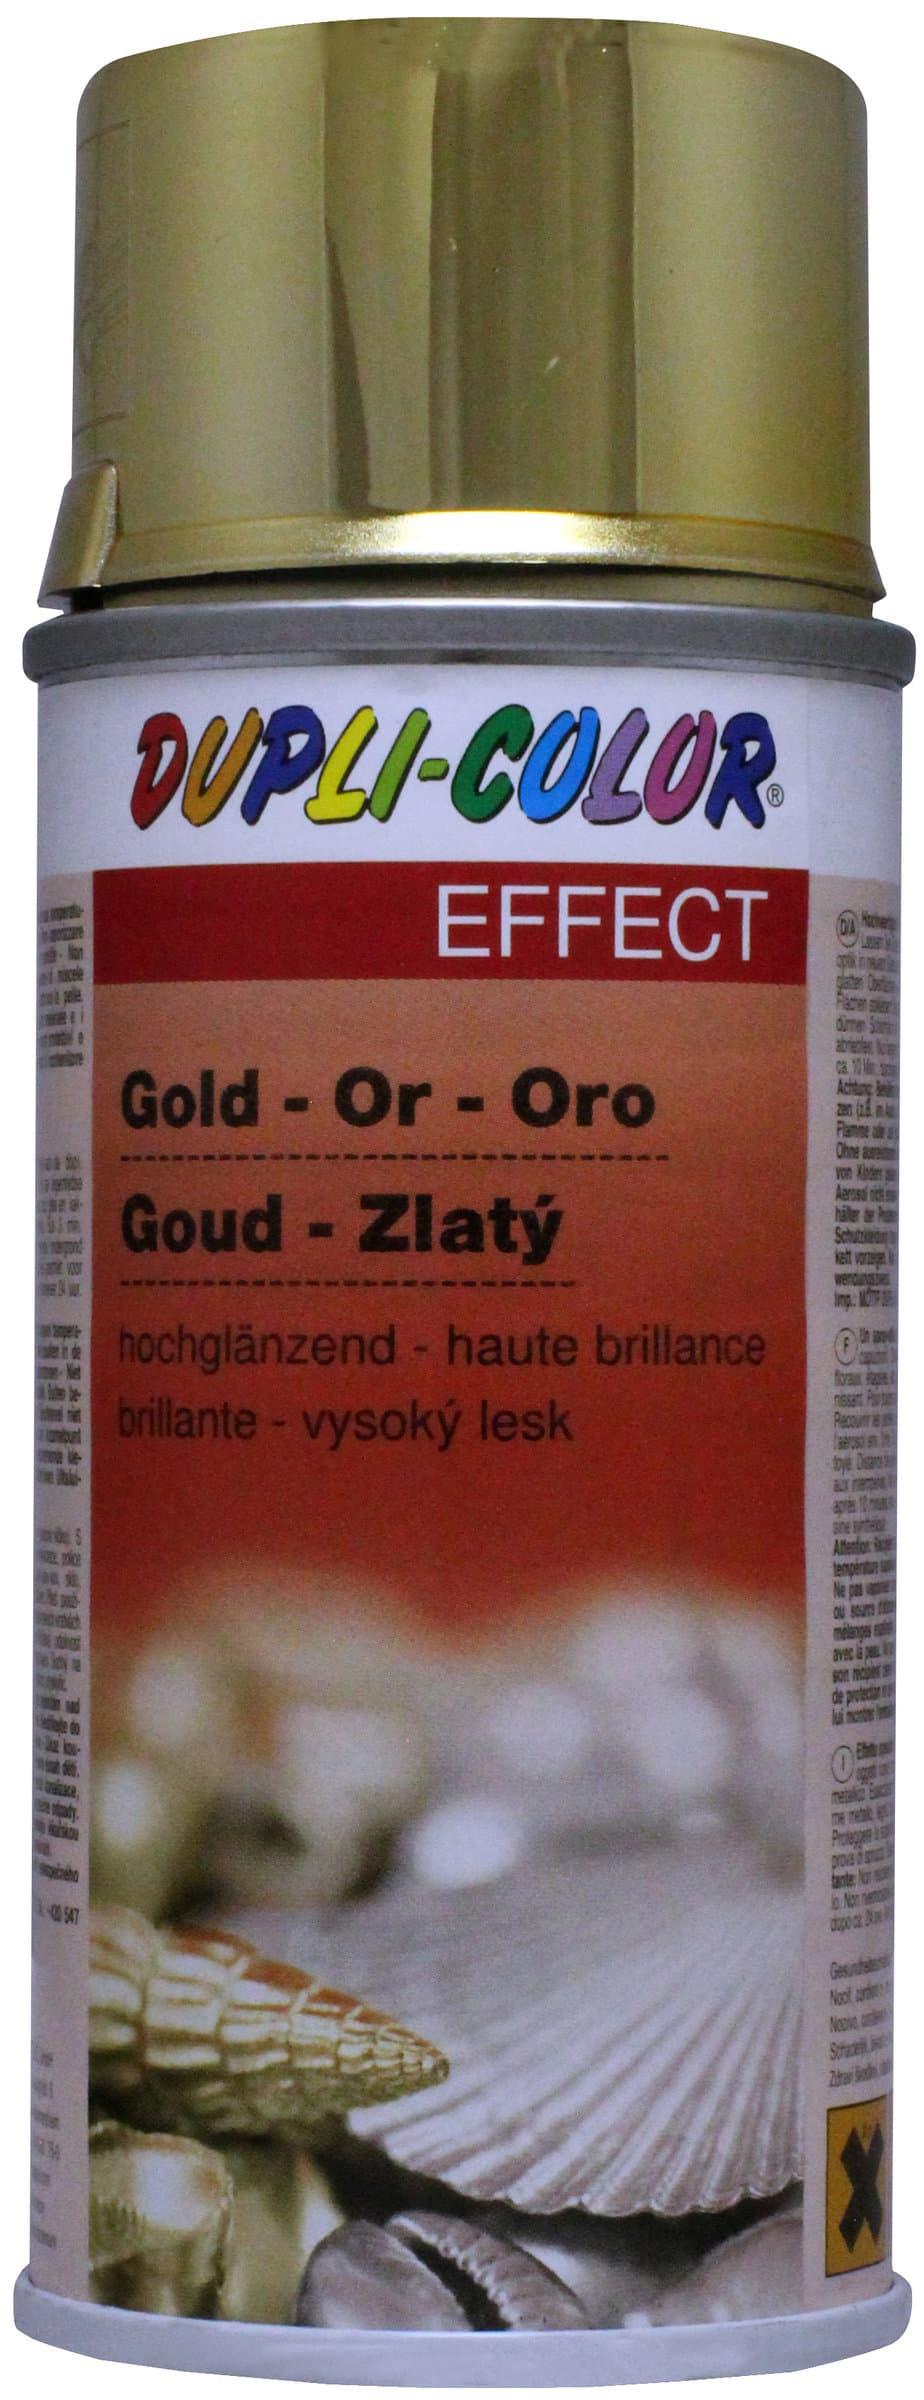 Dupli-Color Vernice spray oro